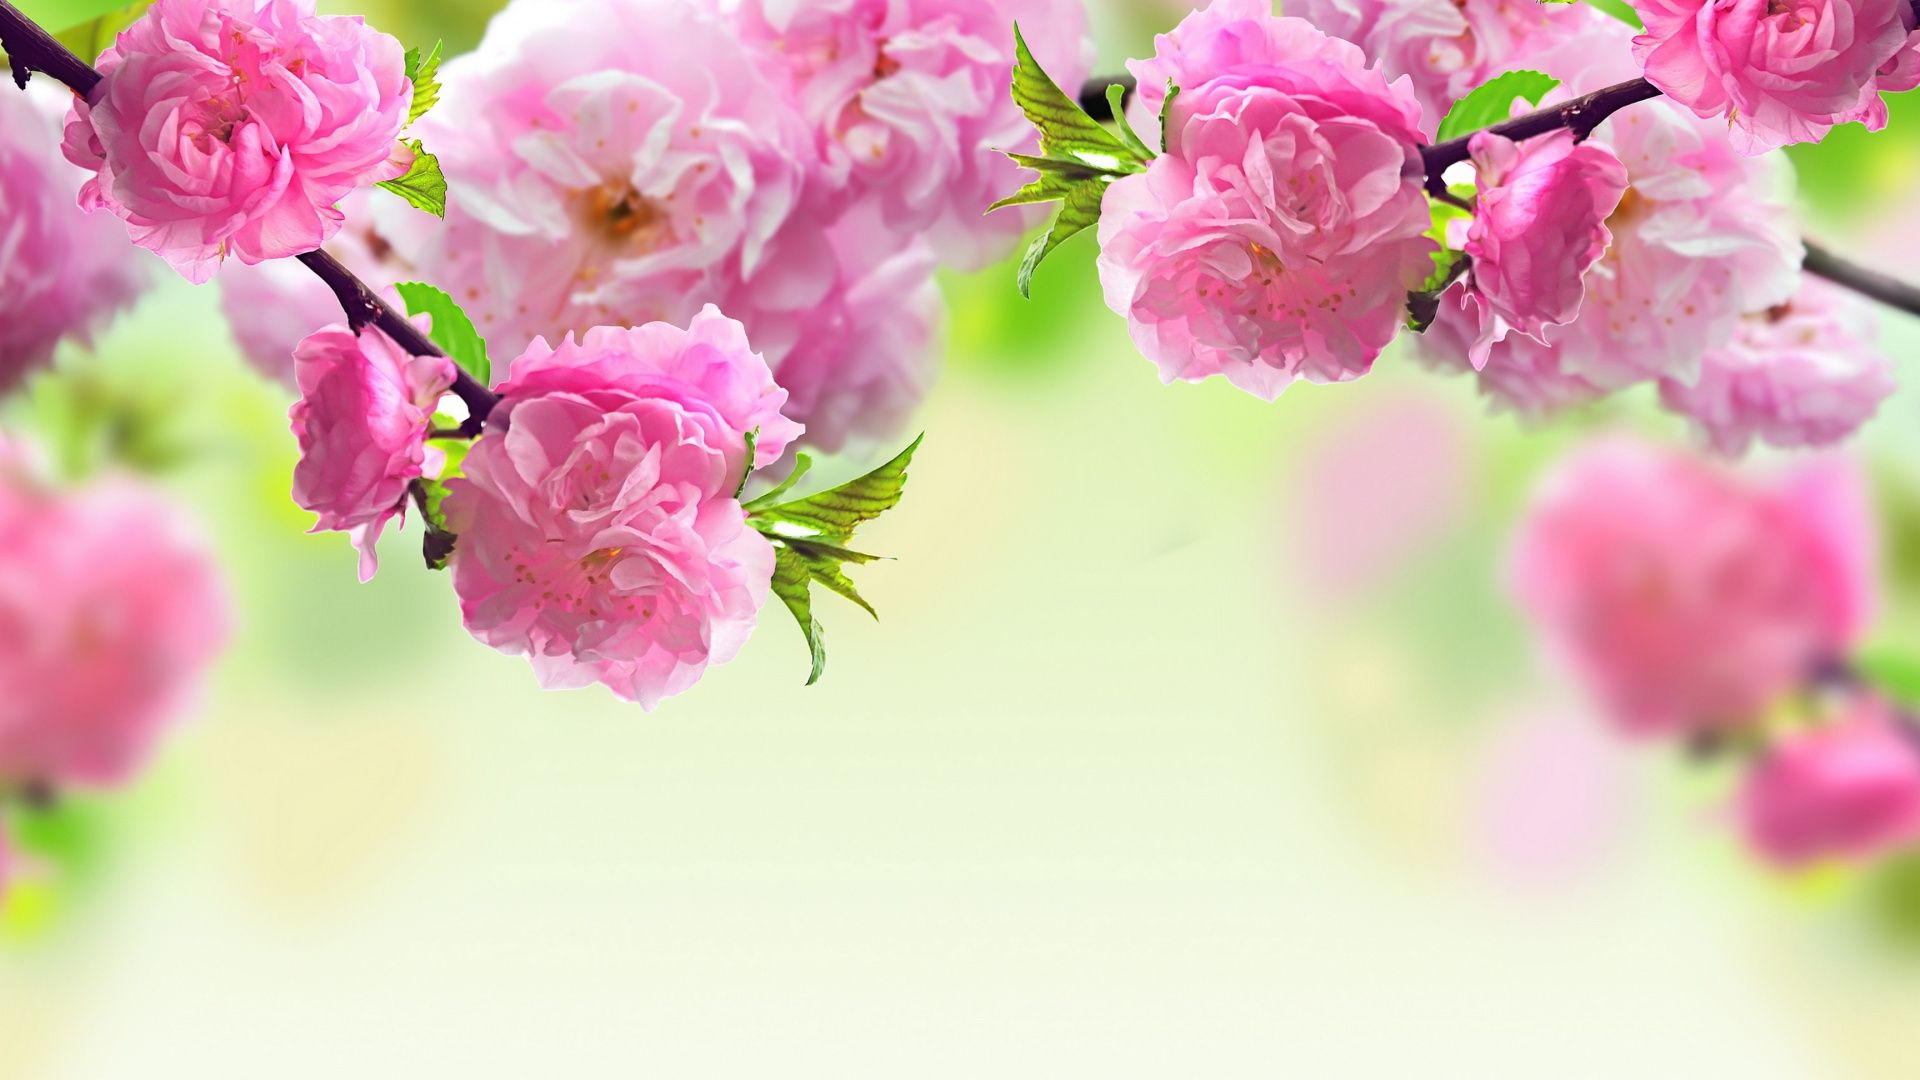 Flower Wallpaper Backgrounds HD Creative Flower Pics Full HD